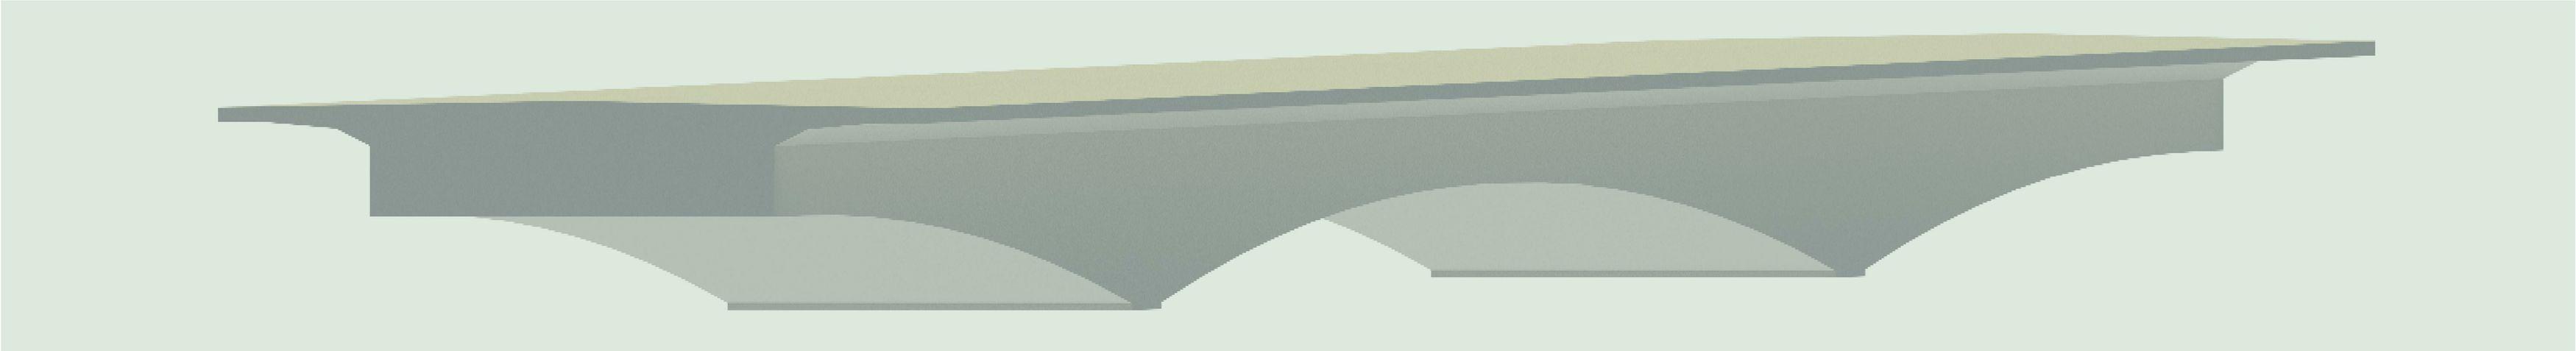 Render---renderizacion---render-superestructura-3500-3500